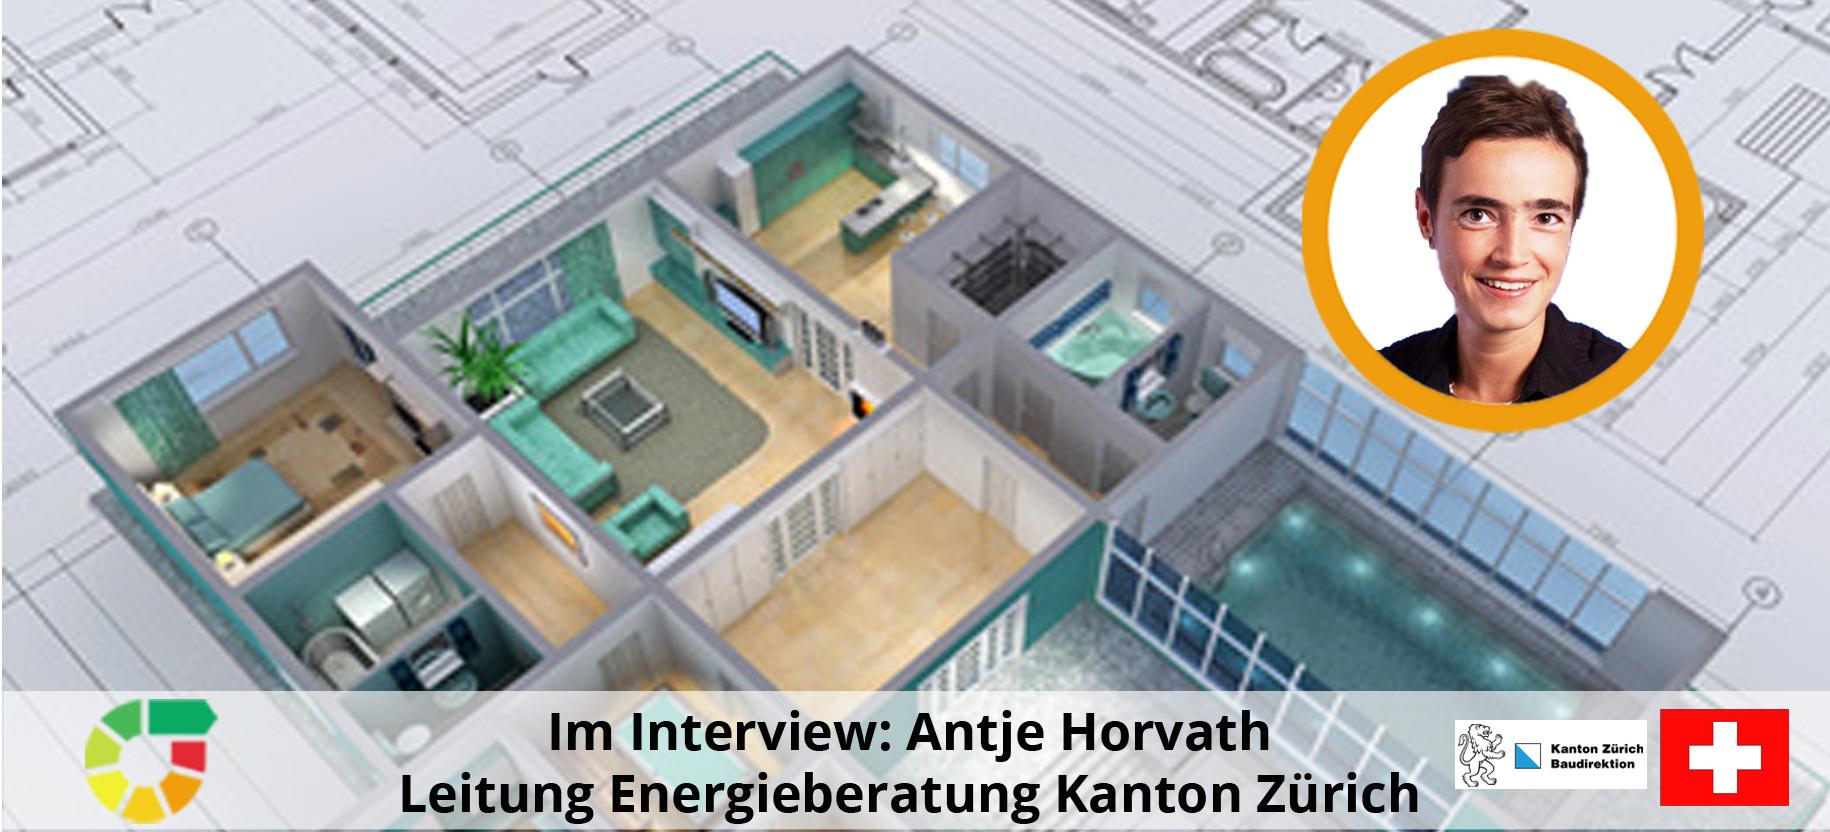 Antje Horvath – Energieberatung Kanton Zürich